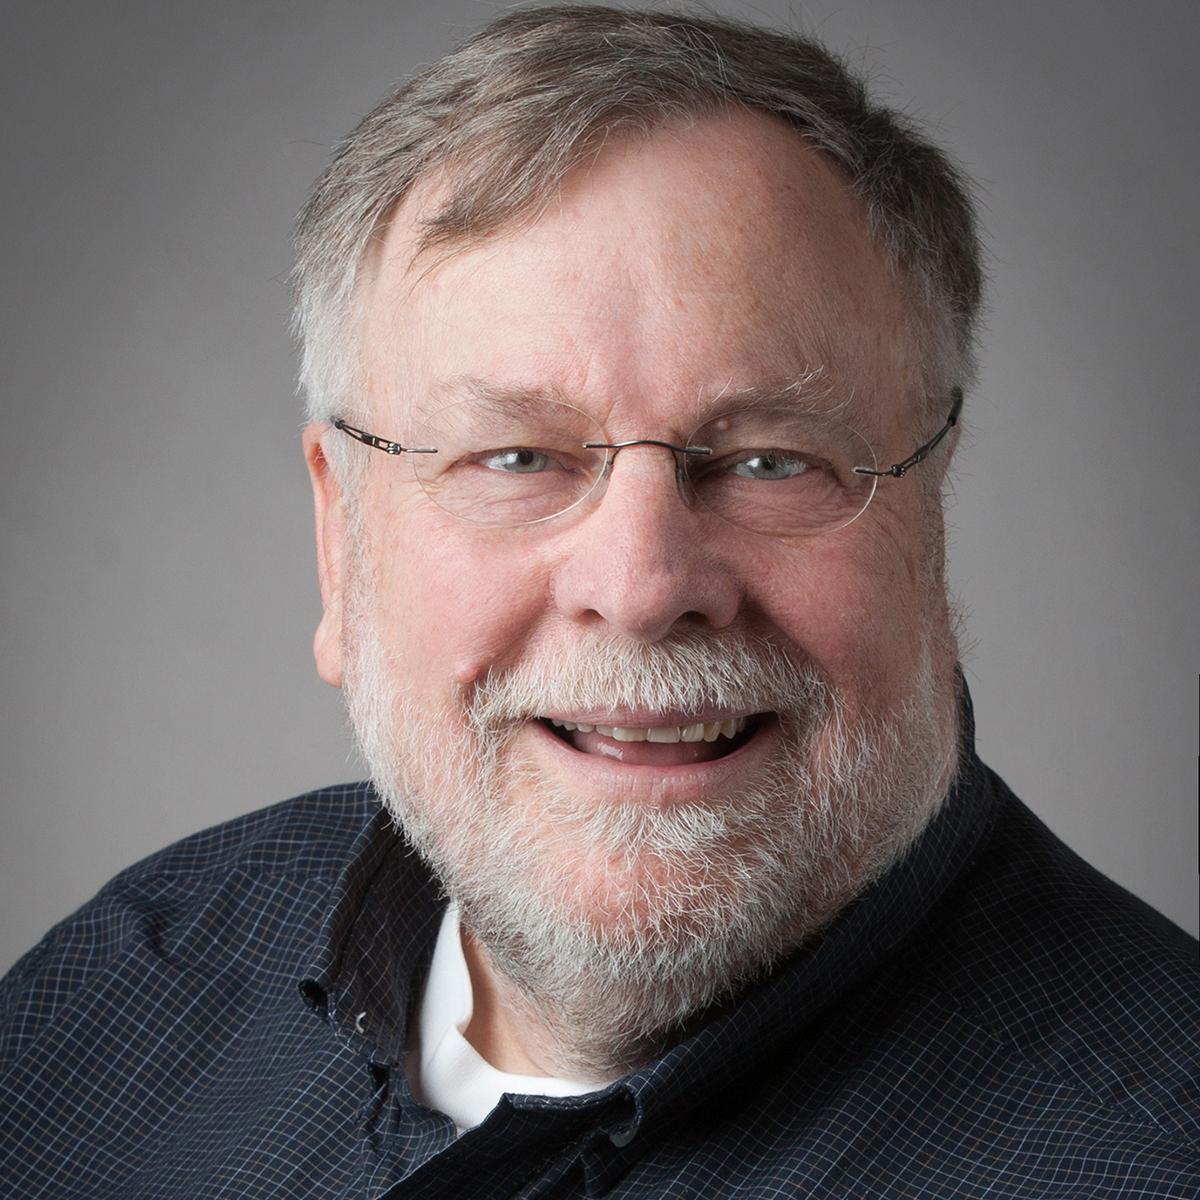 Peter Andersen, AIA Principal